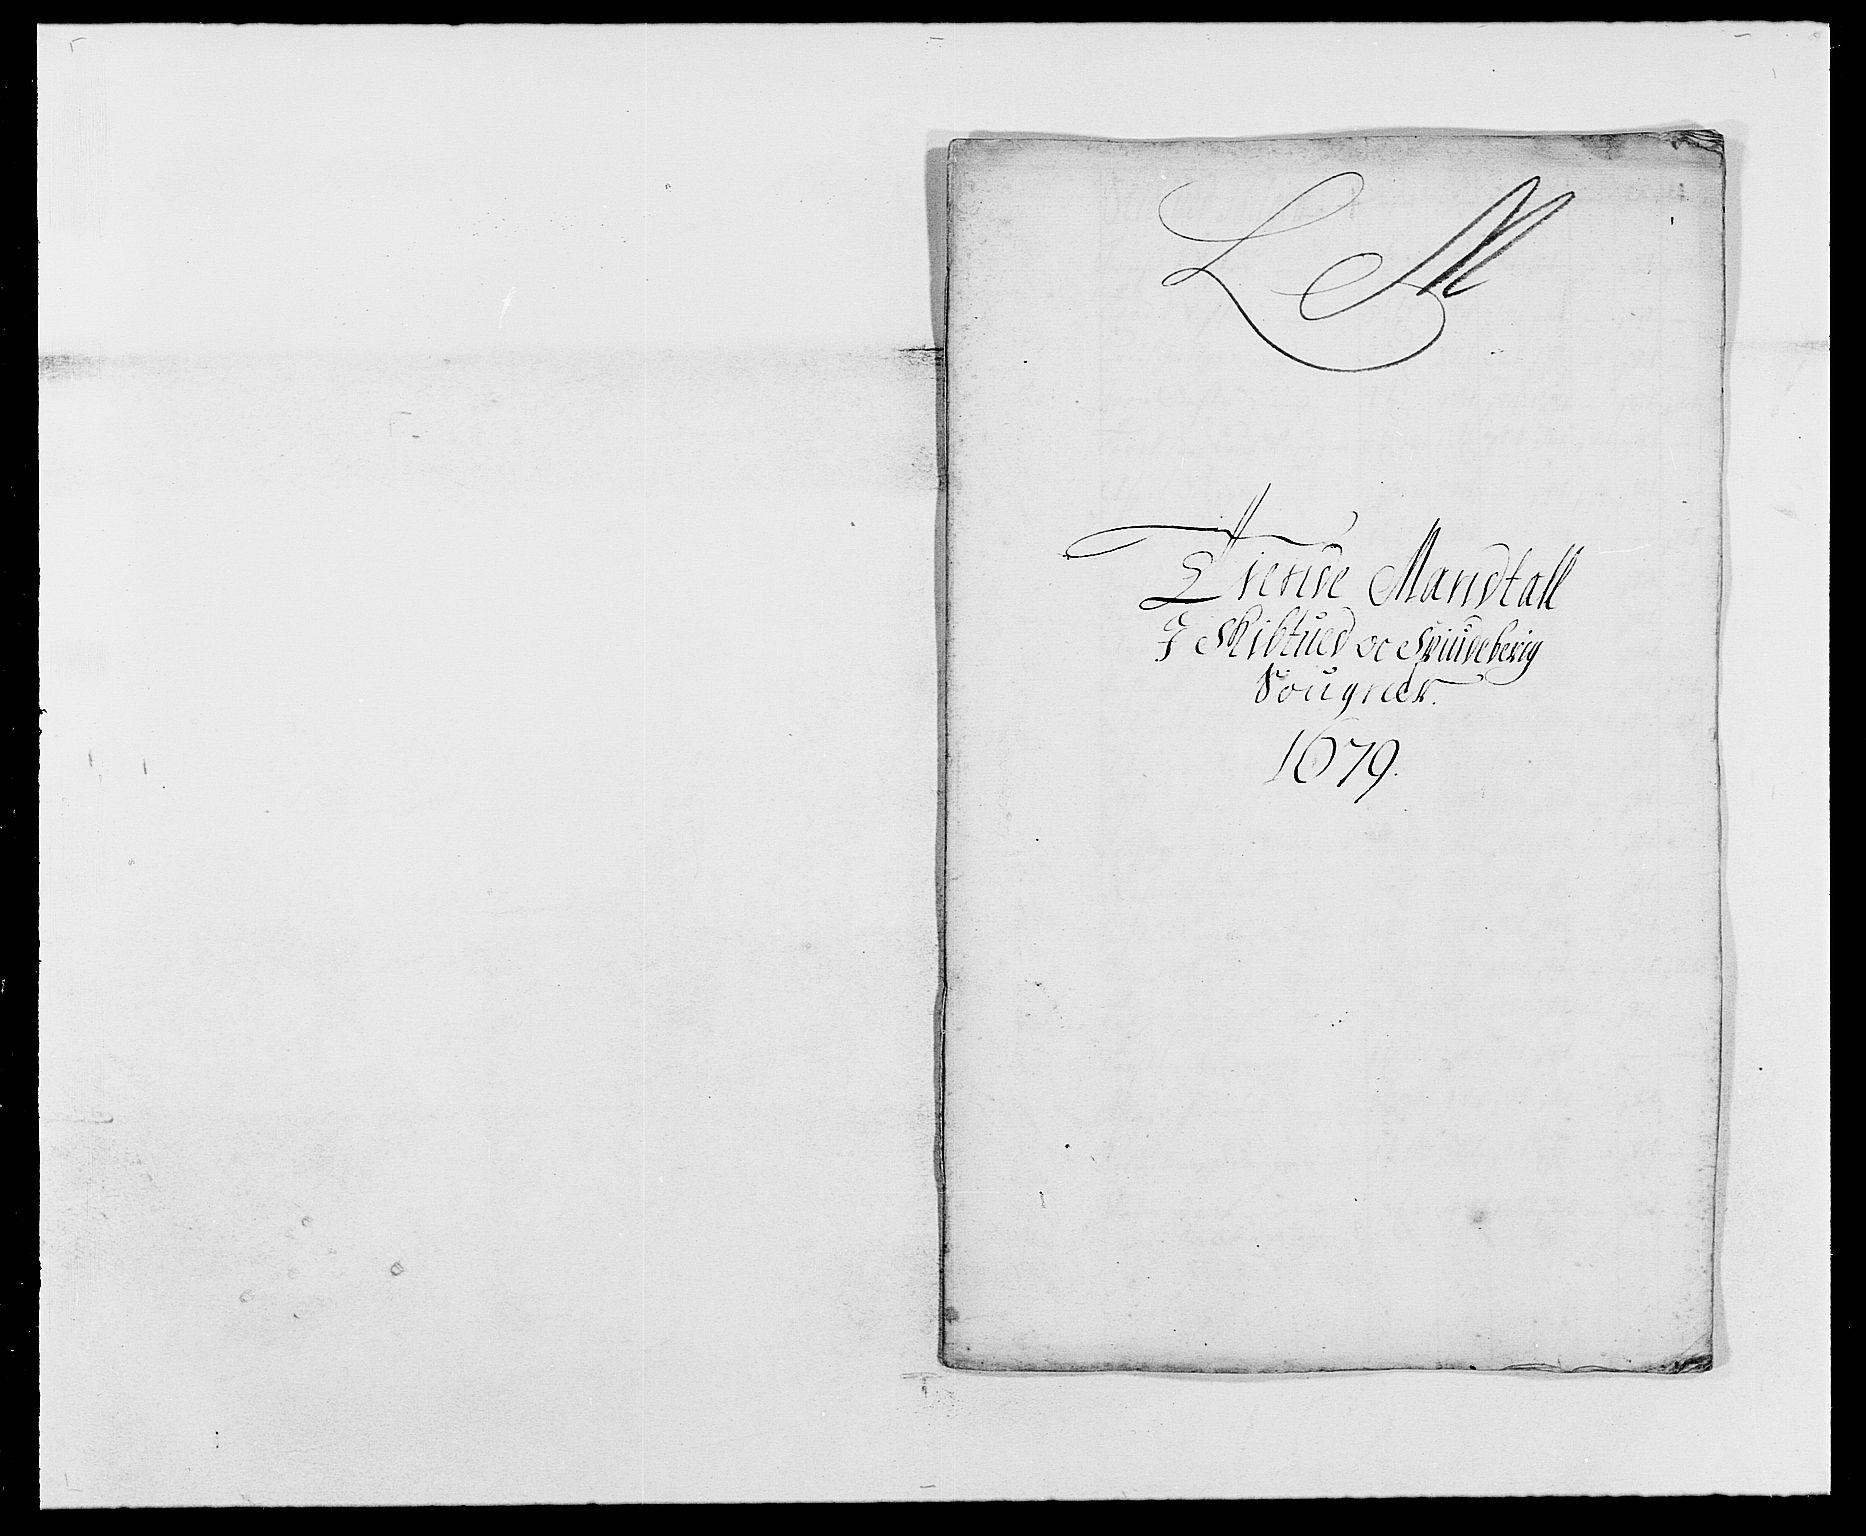 RA, Rentekammeret inntil 1814, Reviderte regnskaper, Fogderegnskap, R05/L0271: Fogderegnskap Rakkestad, 1678-1679, s. 290